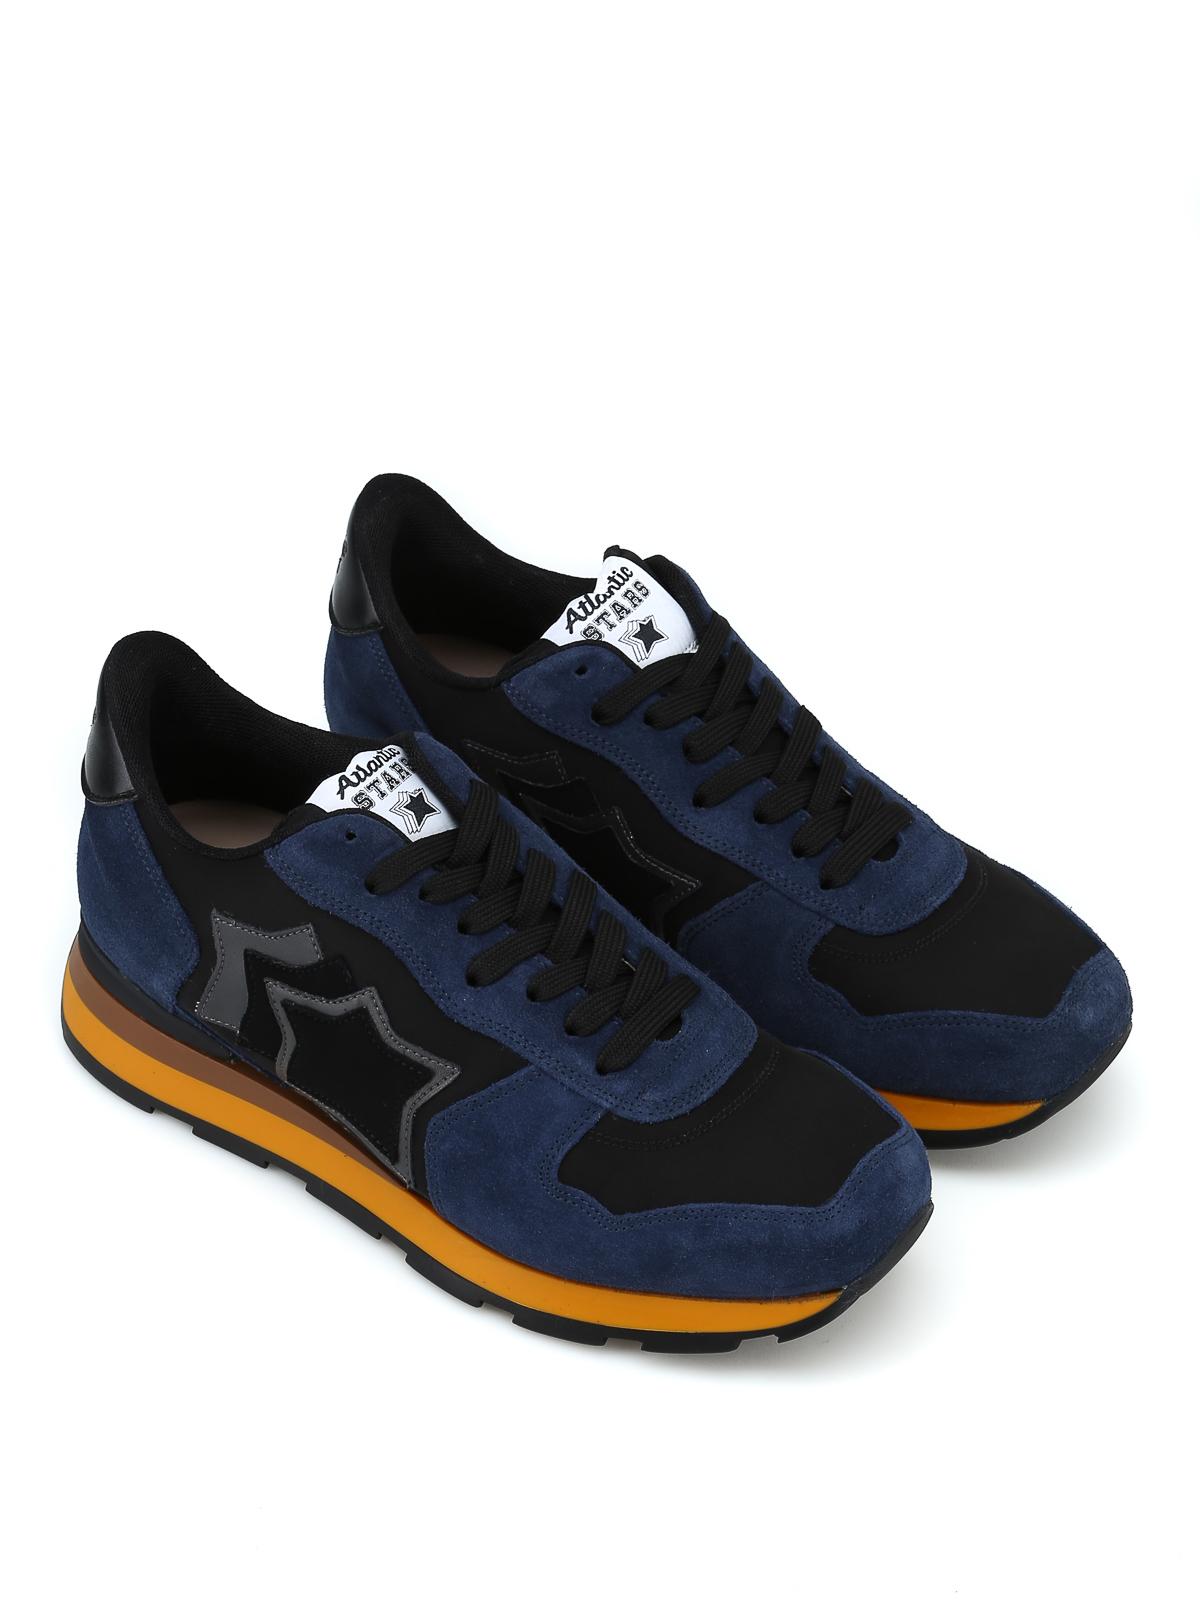 Stars Sneaker Antares Atlantic Blu Nere Sneakers E qaCqxAdFw